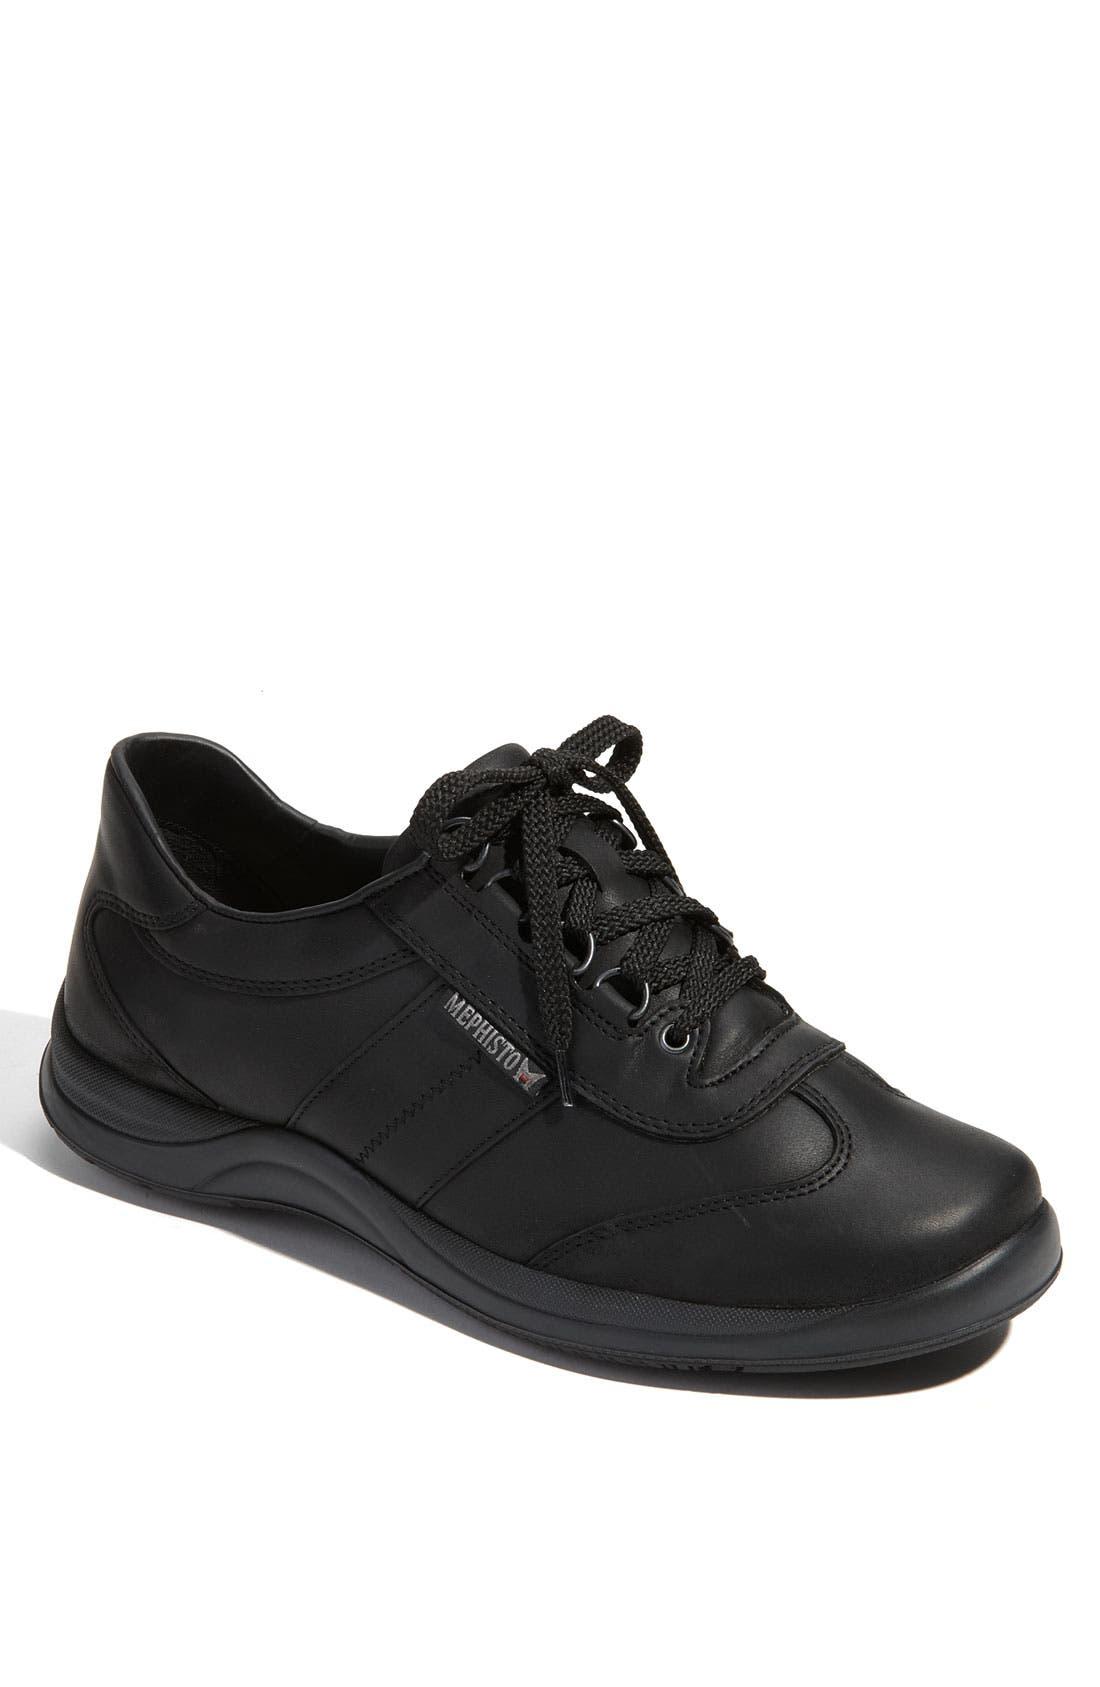 Alternate Image 1 Selected - Mephisto 'Hike' Walking Shoe (Men)